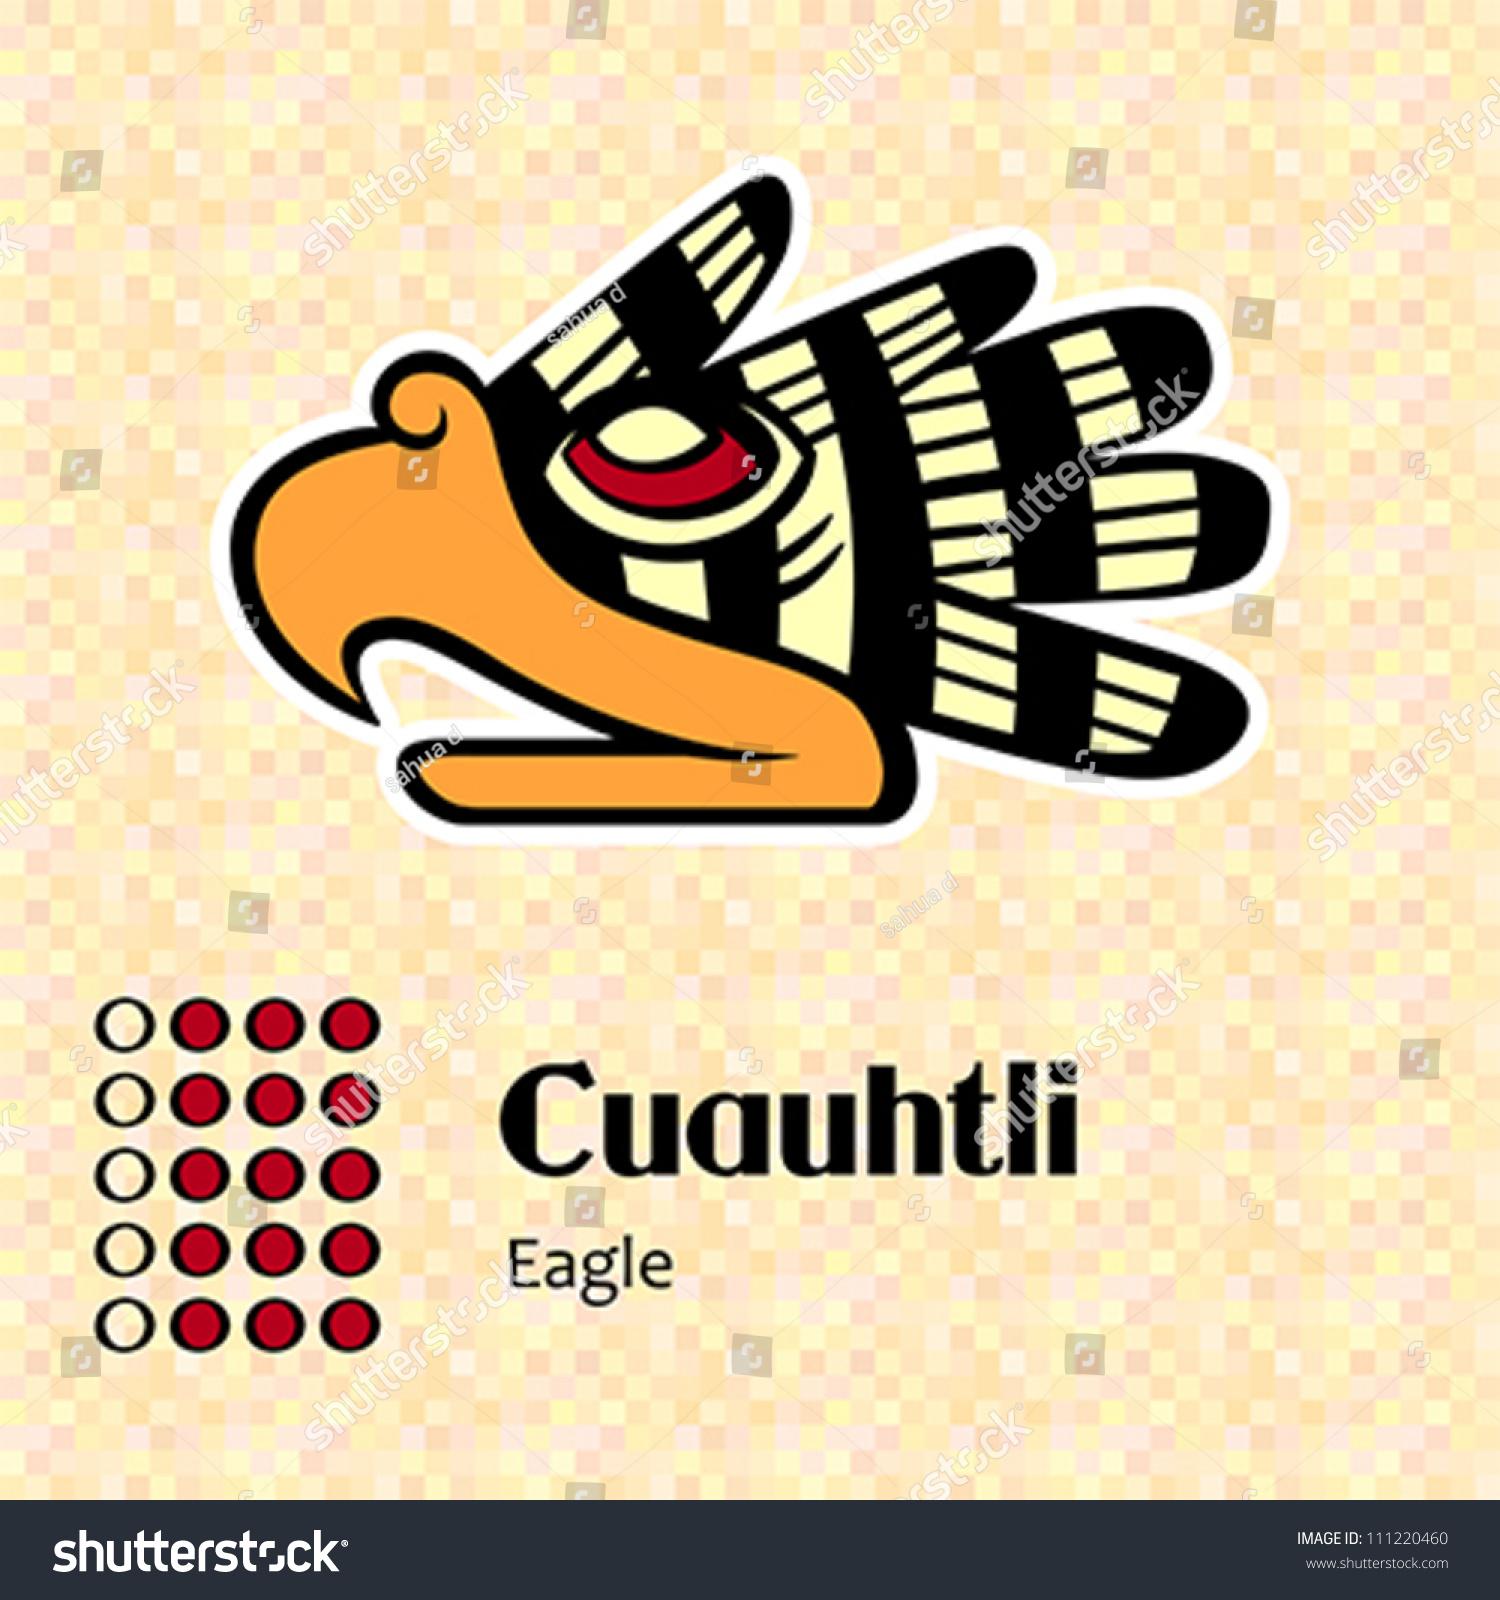 Aztec calendar symbols cuauhtli eagle 15 stock vector 111220460 aztec calendar symbols cuauhtli or eagle 15 biocorpaavc Gallery